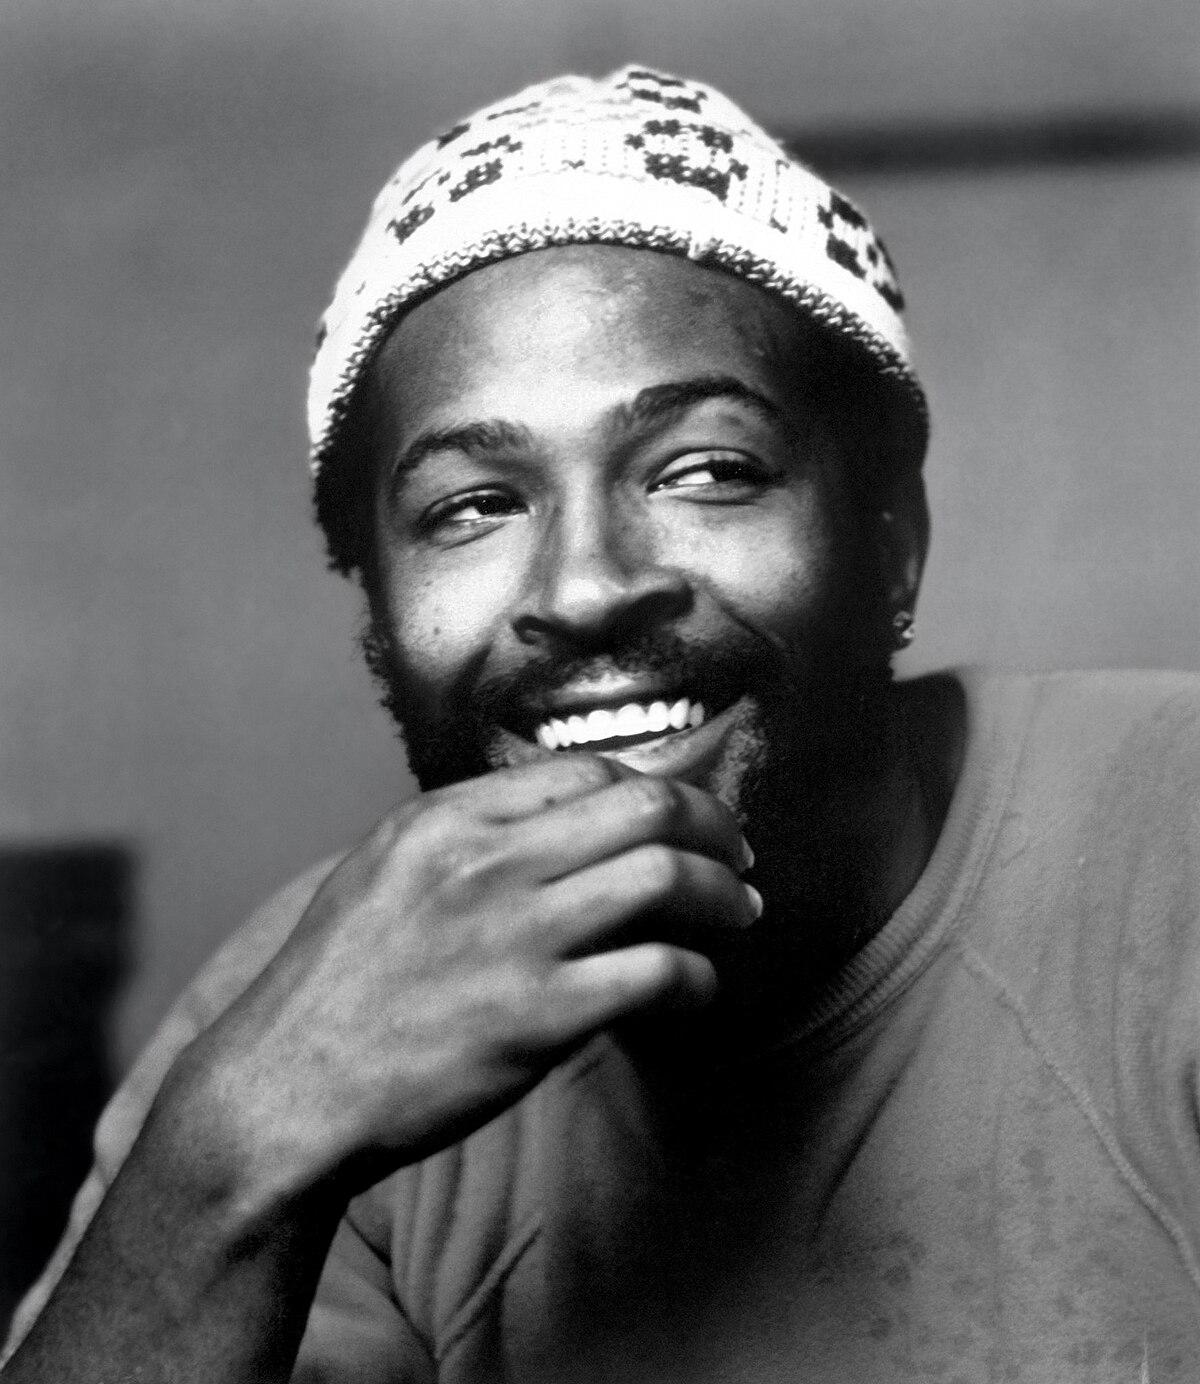 Marvin Gaye Wikipedia